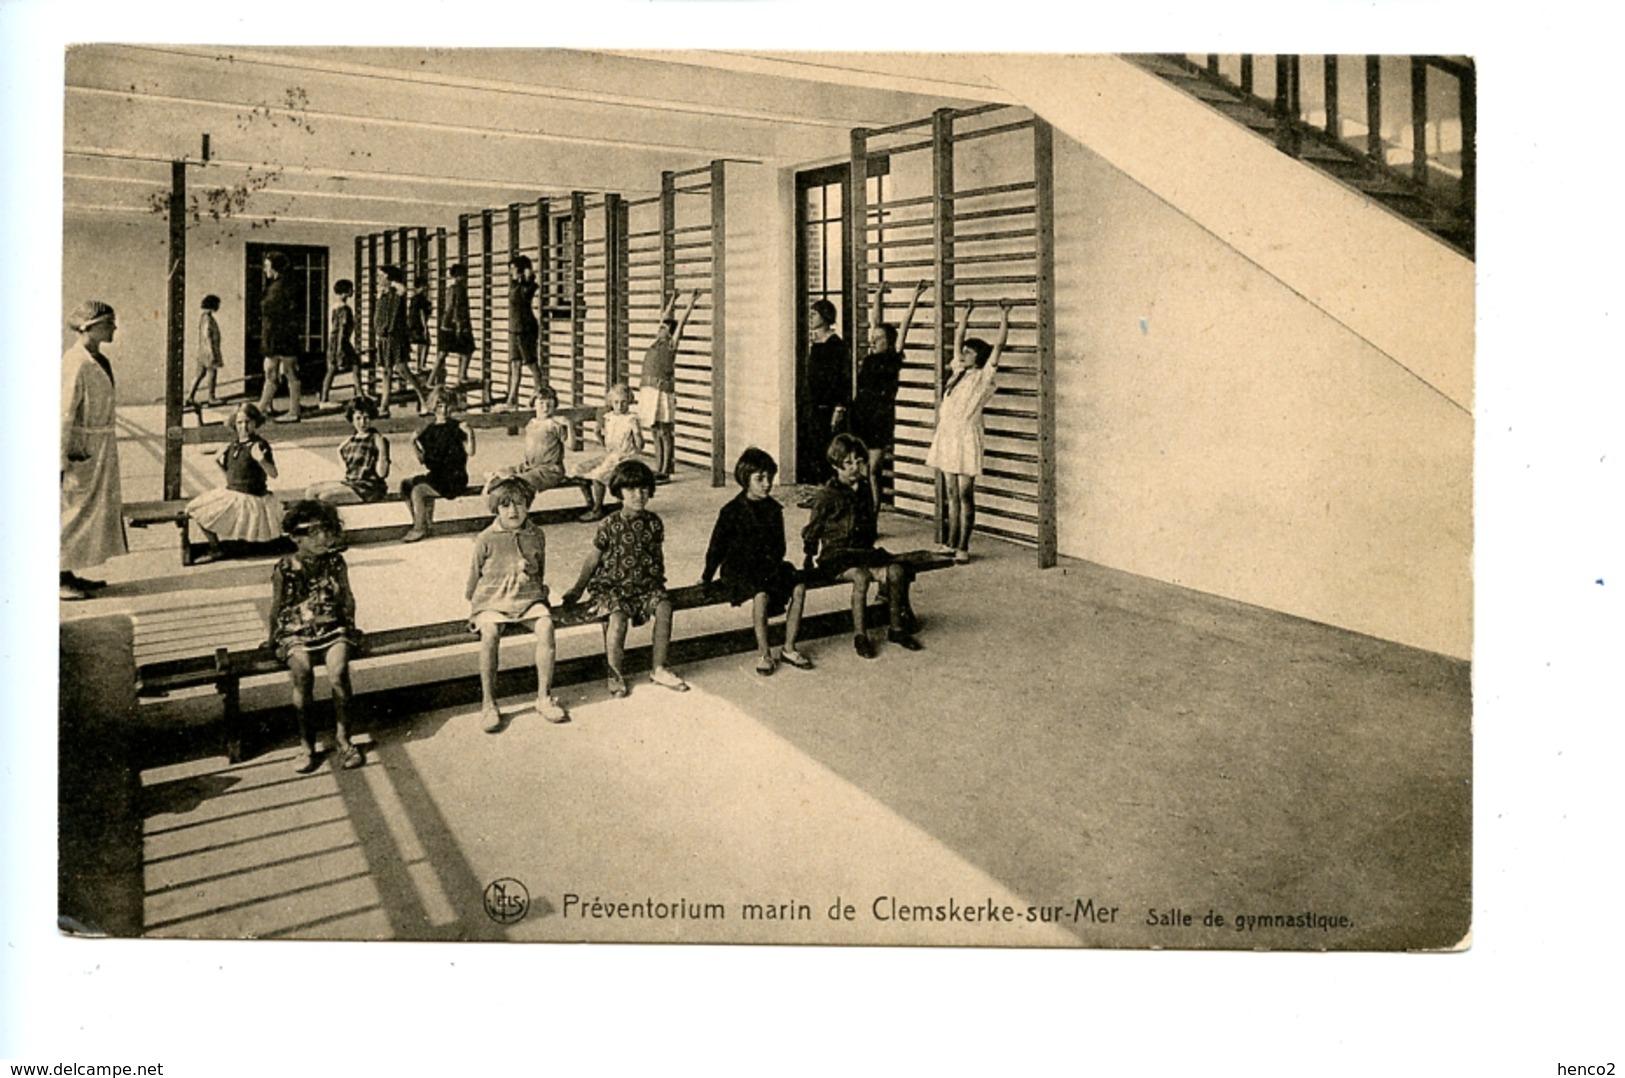 Préventorium Marin De Clemskerke Sur Mer - Salle De Gymnastique (1928) - De Haan